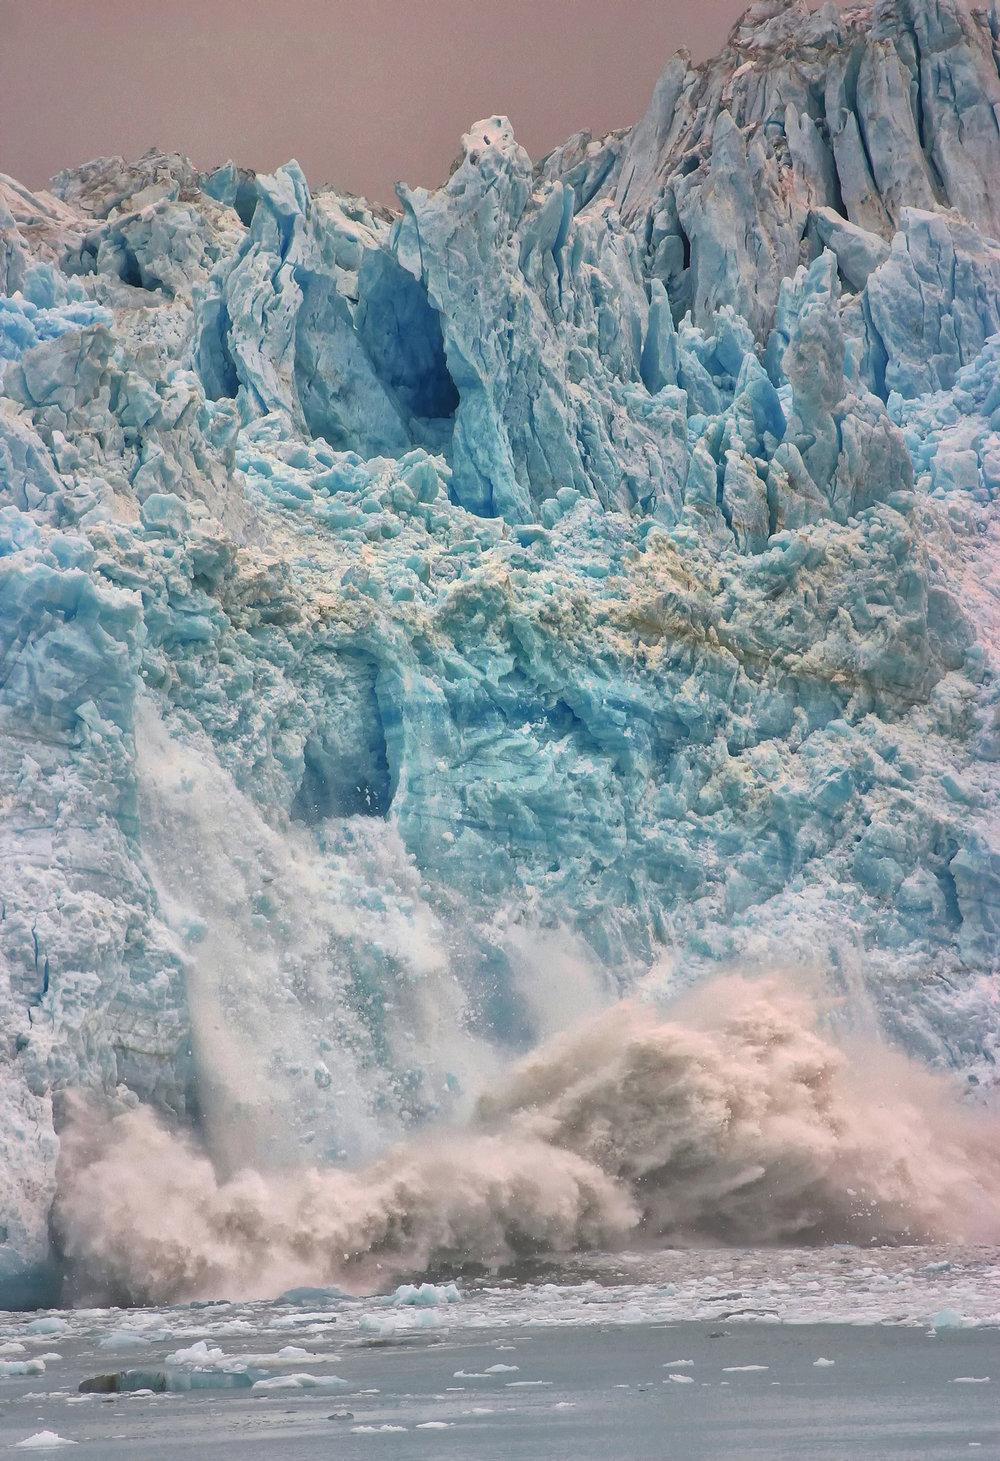 33 Barry_Greff_Glacier-Ocean_Views.jpg